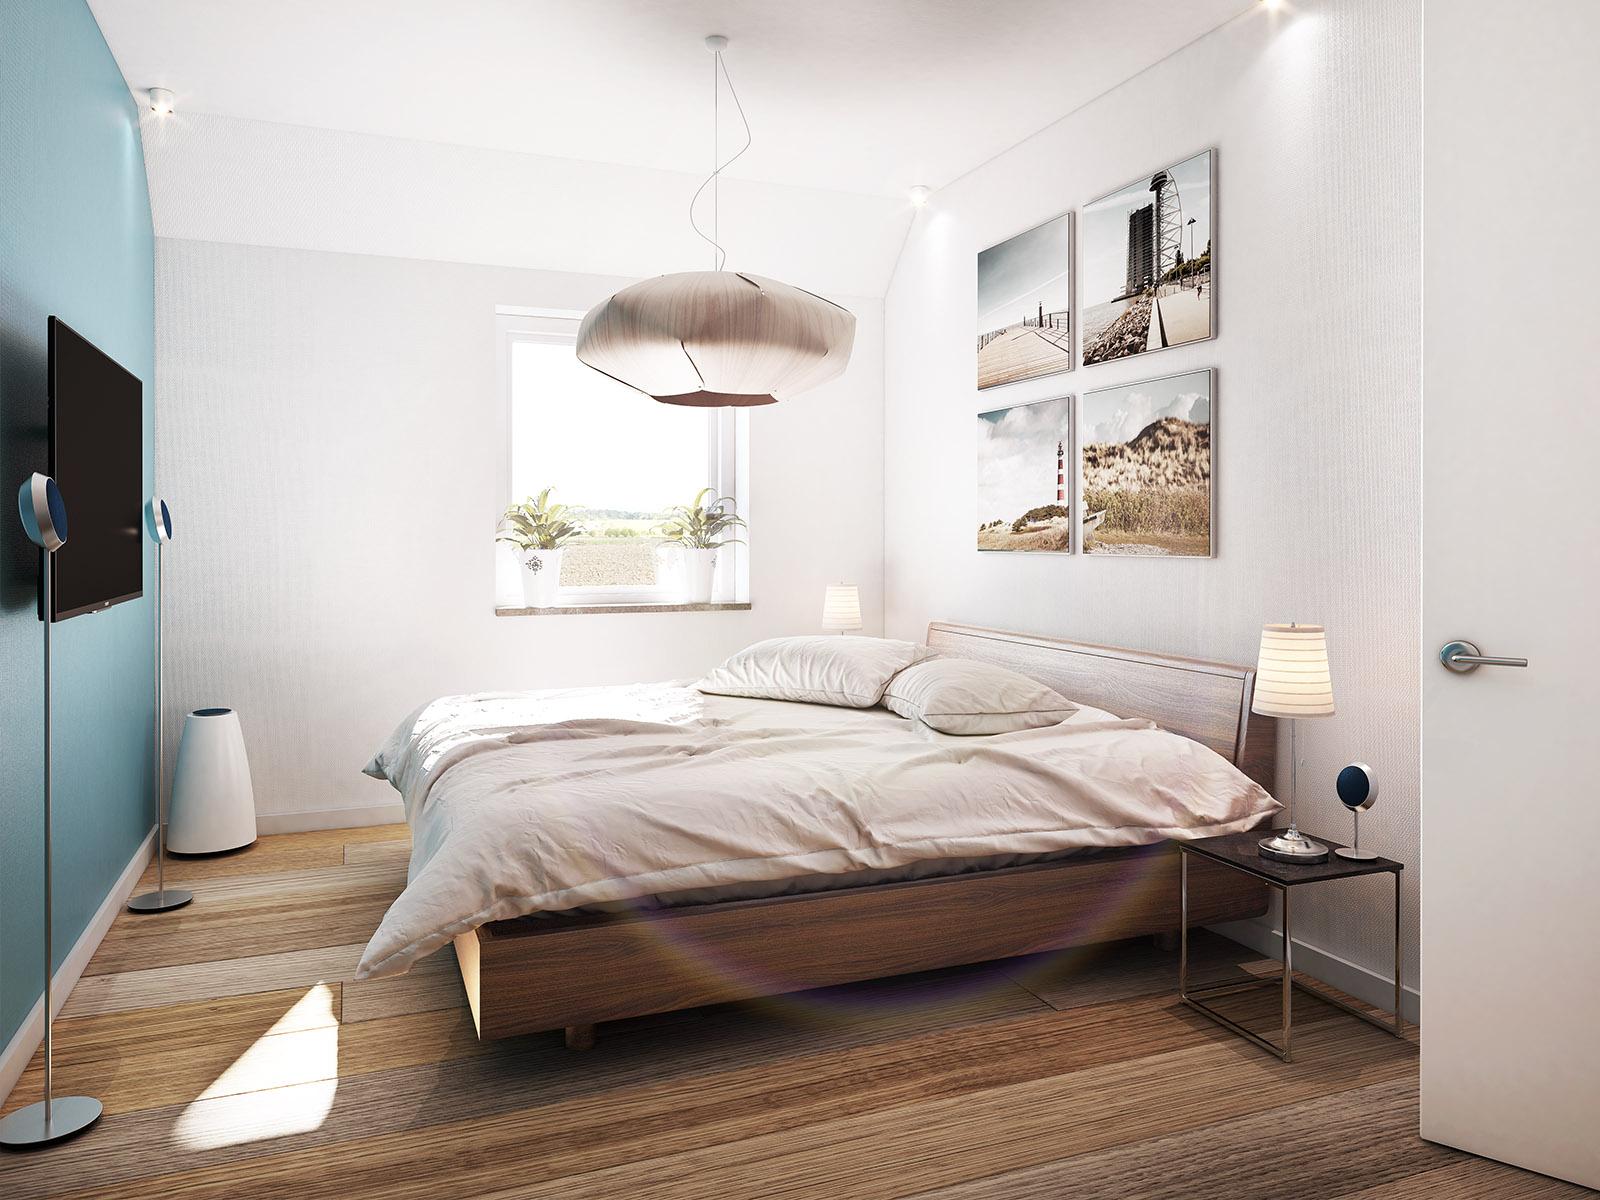 slaapkamer interieur visualisatie DWanimations